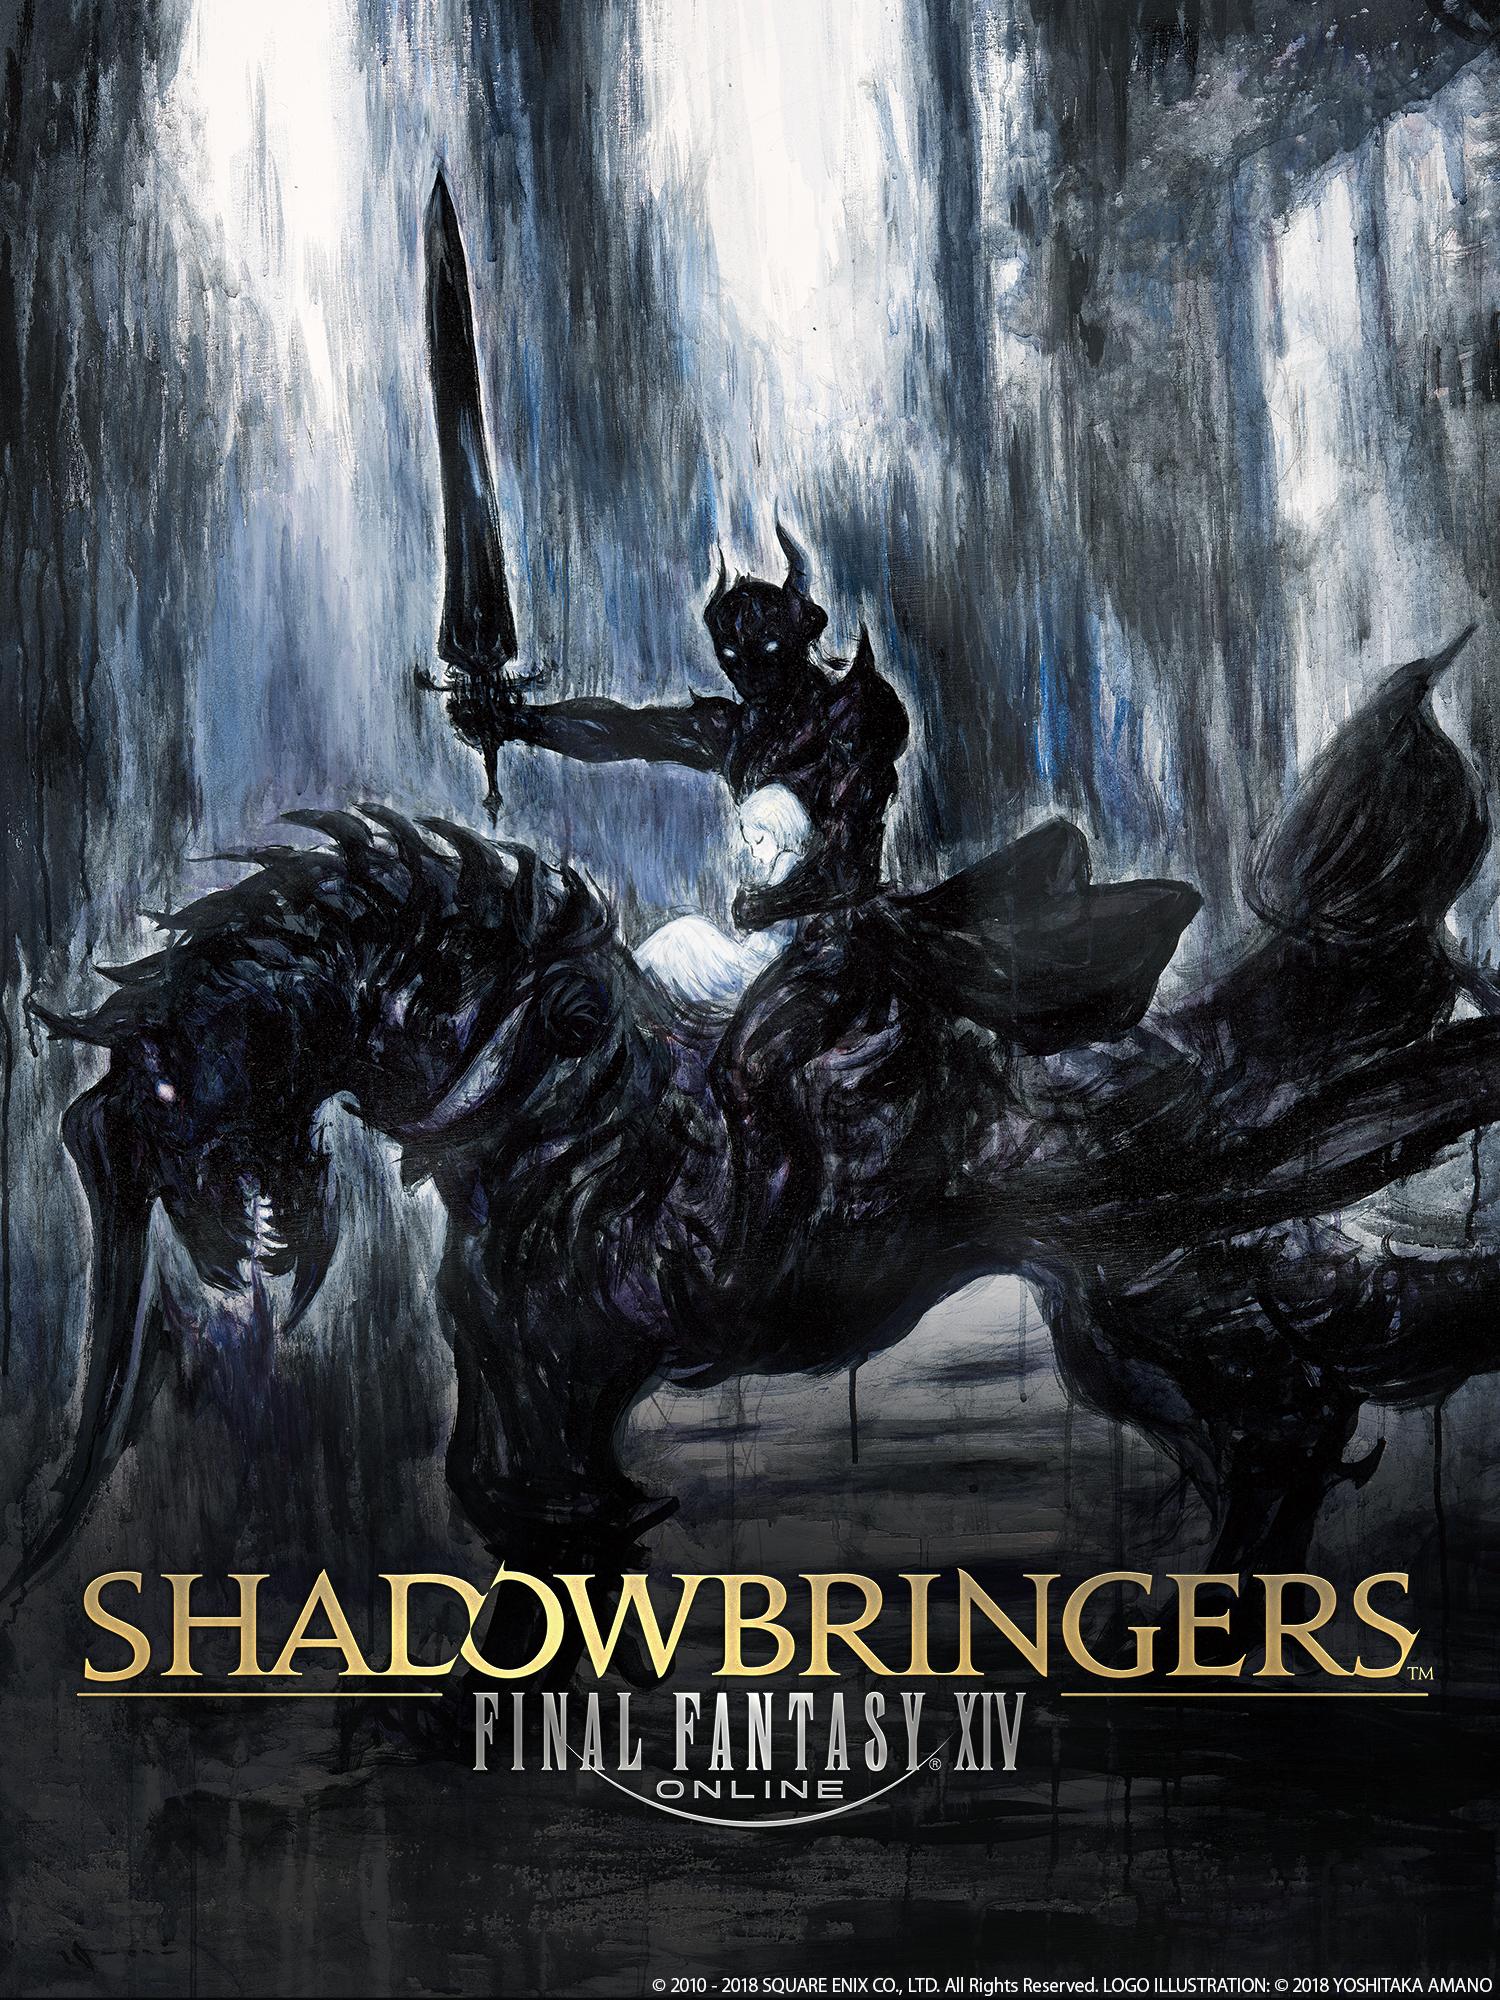 Shadowbringers Artwork by Yoshitaka Amano